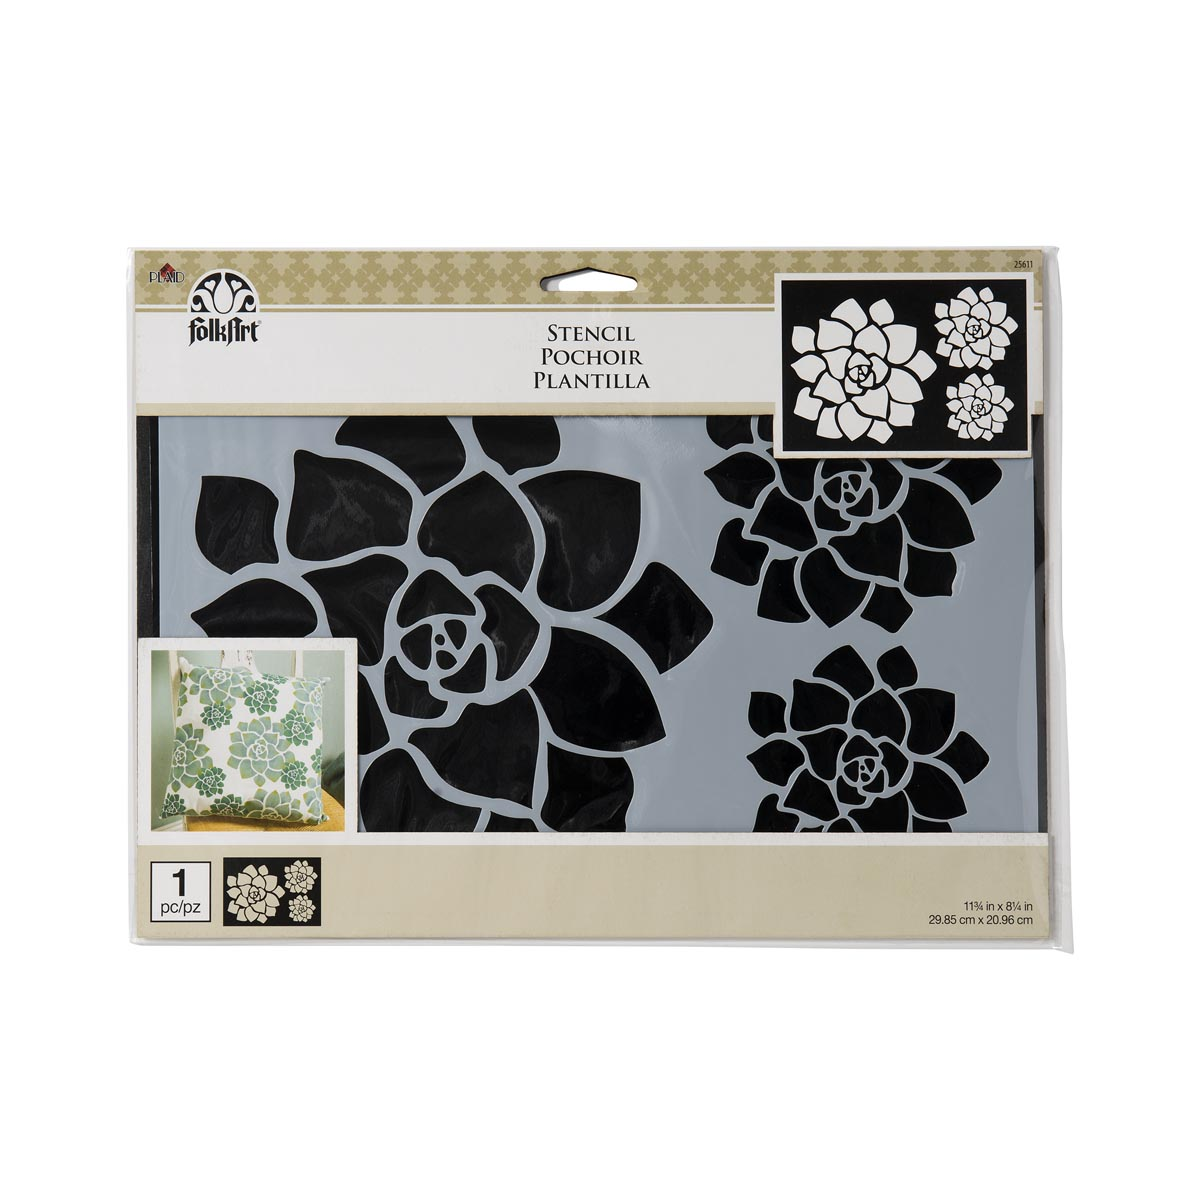 FolkArt ® Painting Stencils - Succulent Motif - 25611